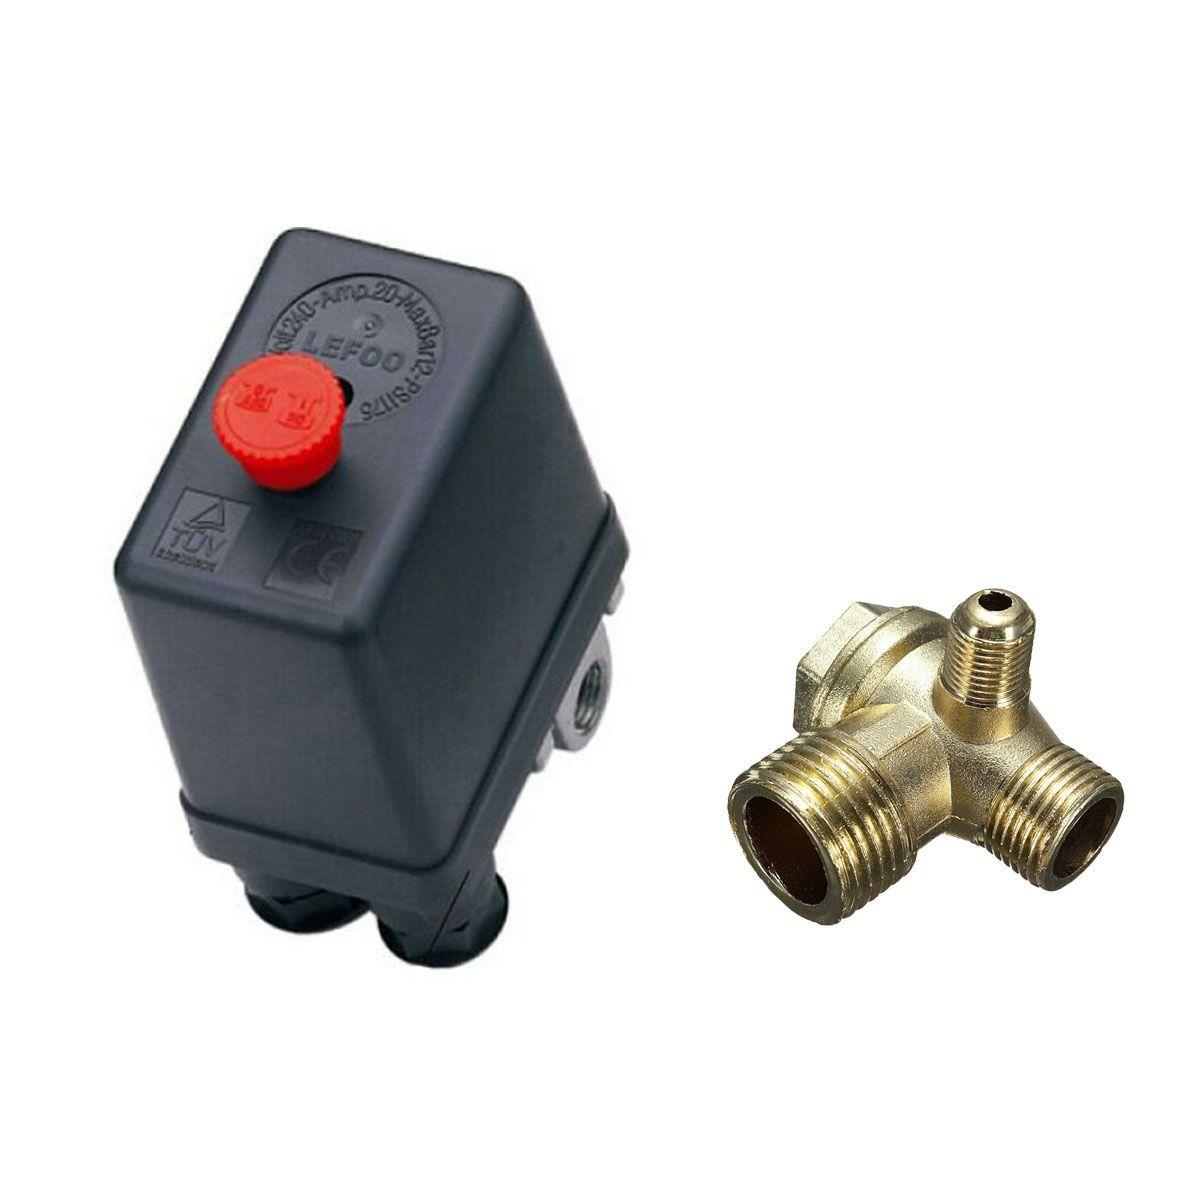 Pressostato Motocompressor 80 - 120 Psi + Válvula Retenção